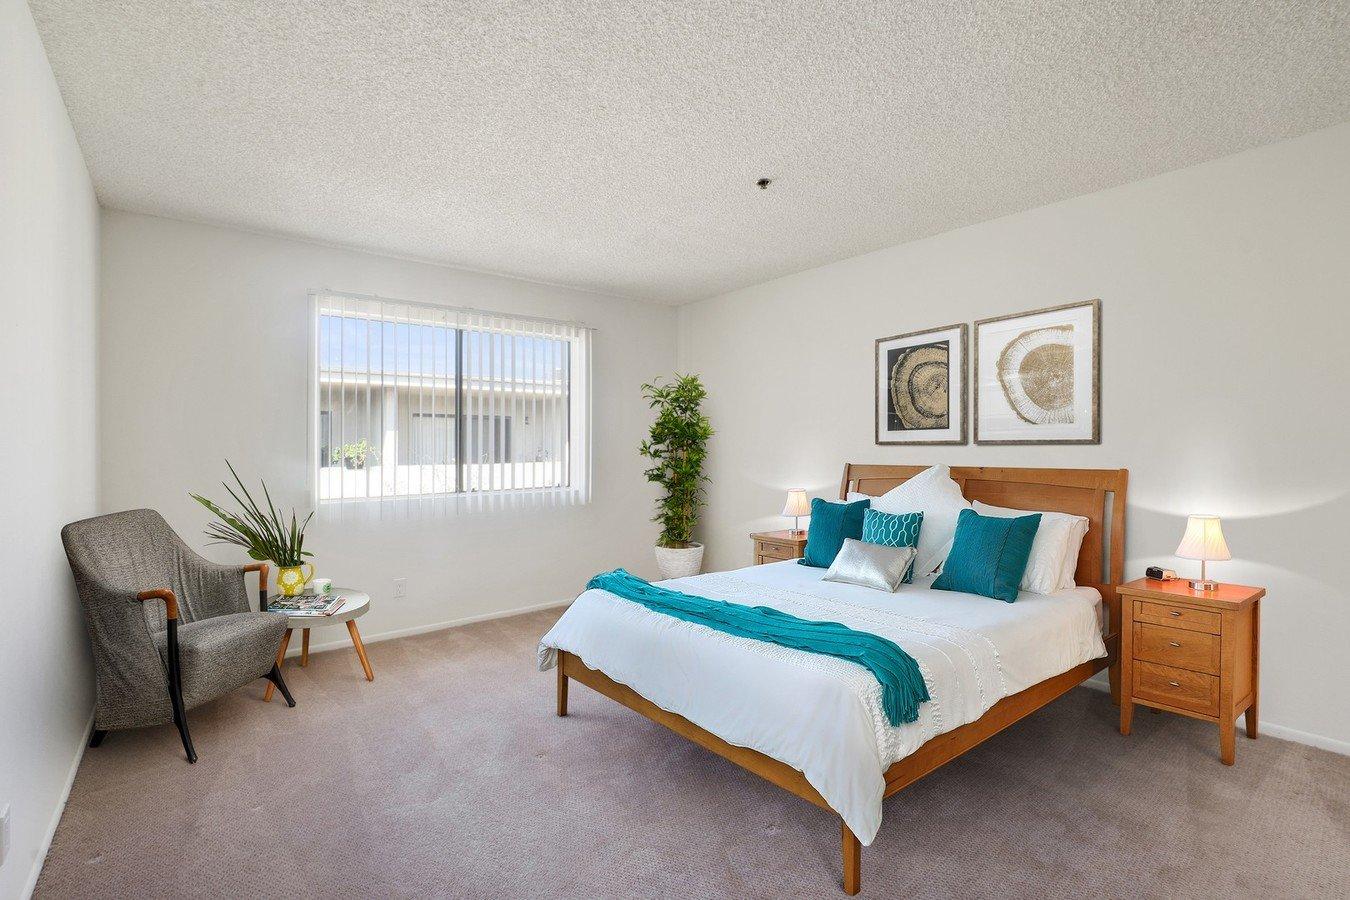 2 Bedrooms 2 Bathrooms Apartment for rent at Encino Majestic in Encino, CA